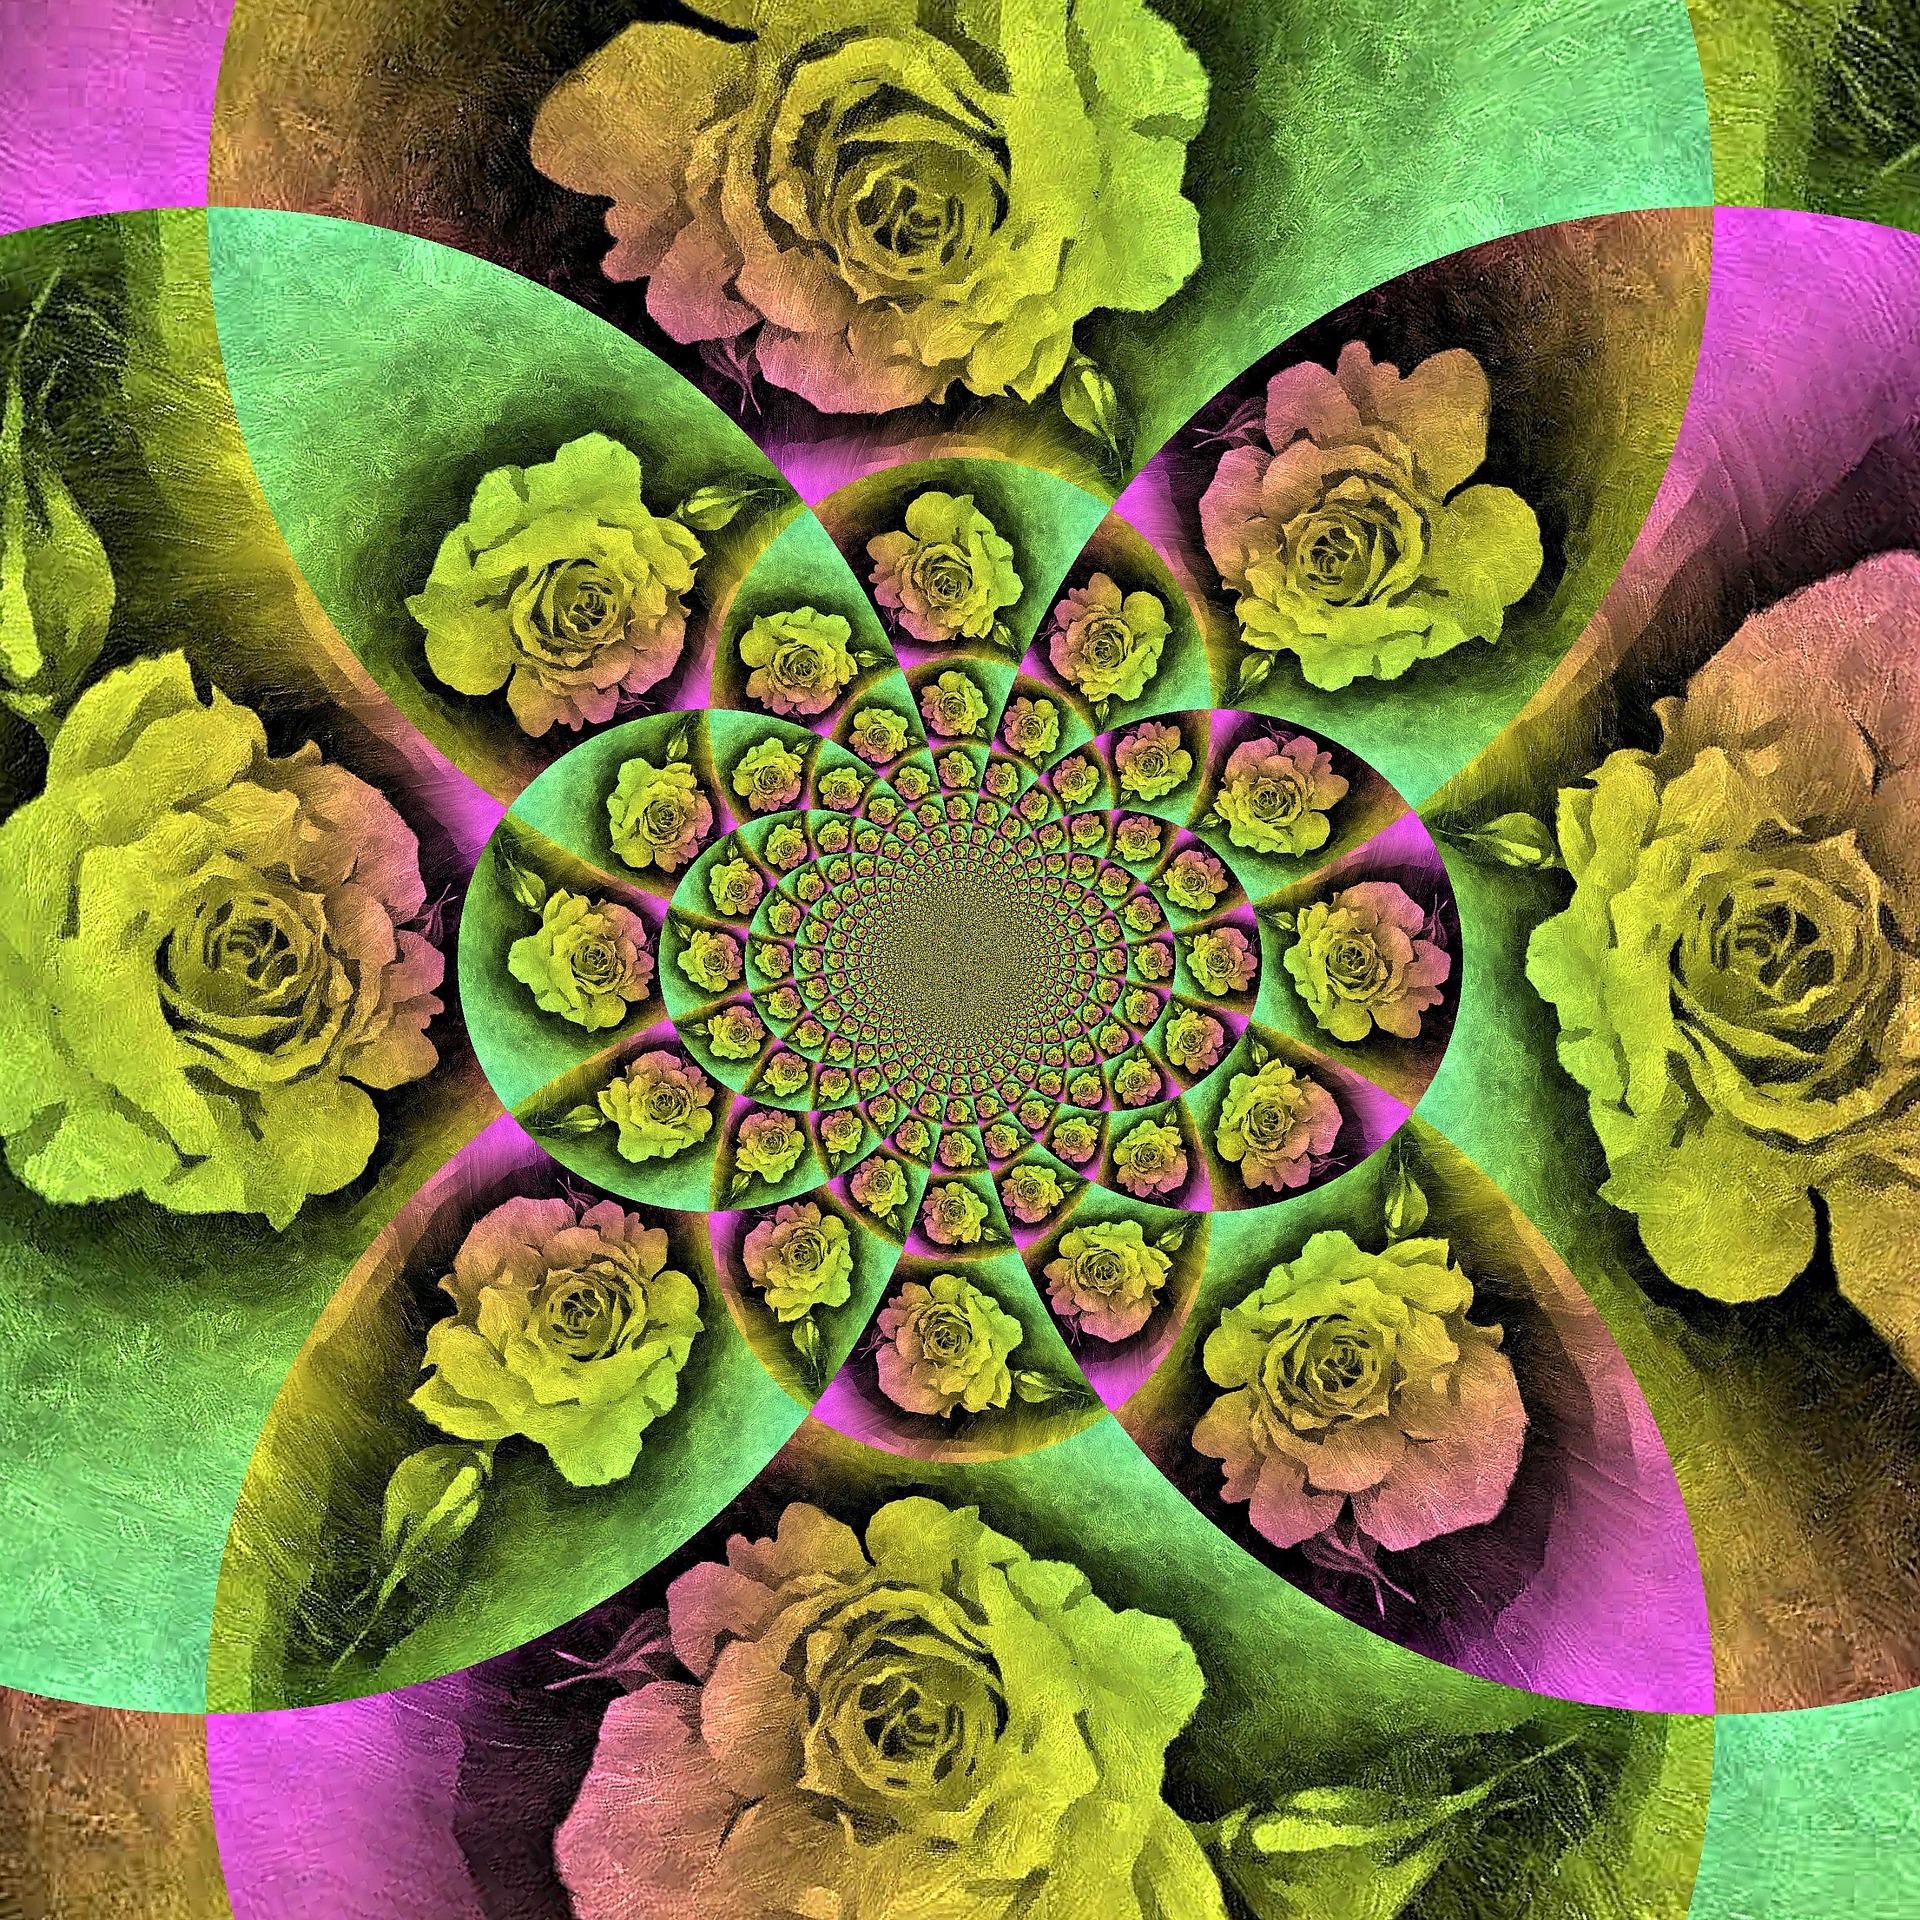 style&kyle    #rose #art #modern #desert #plant #roses #flower #yucca #yuccafest #music #artandmusic #create #active